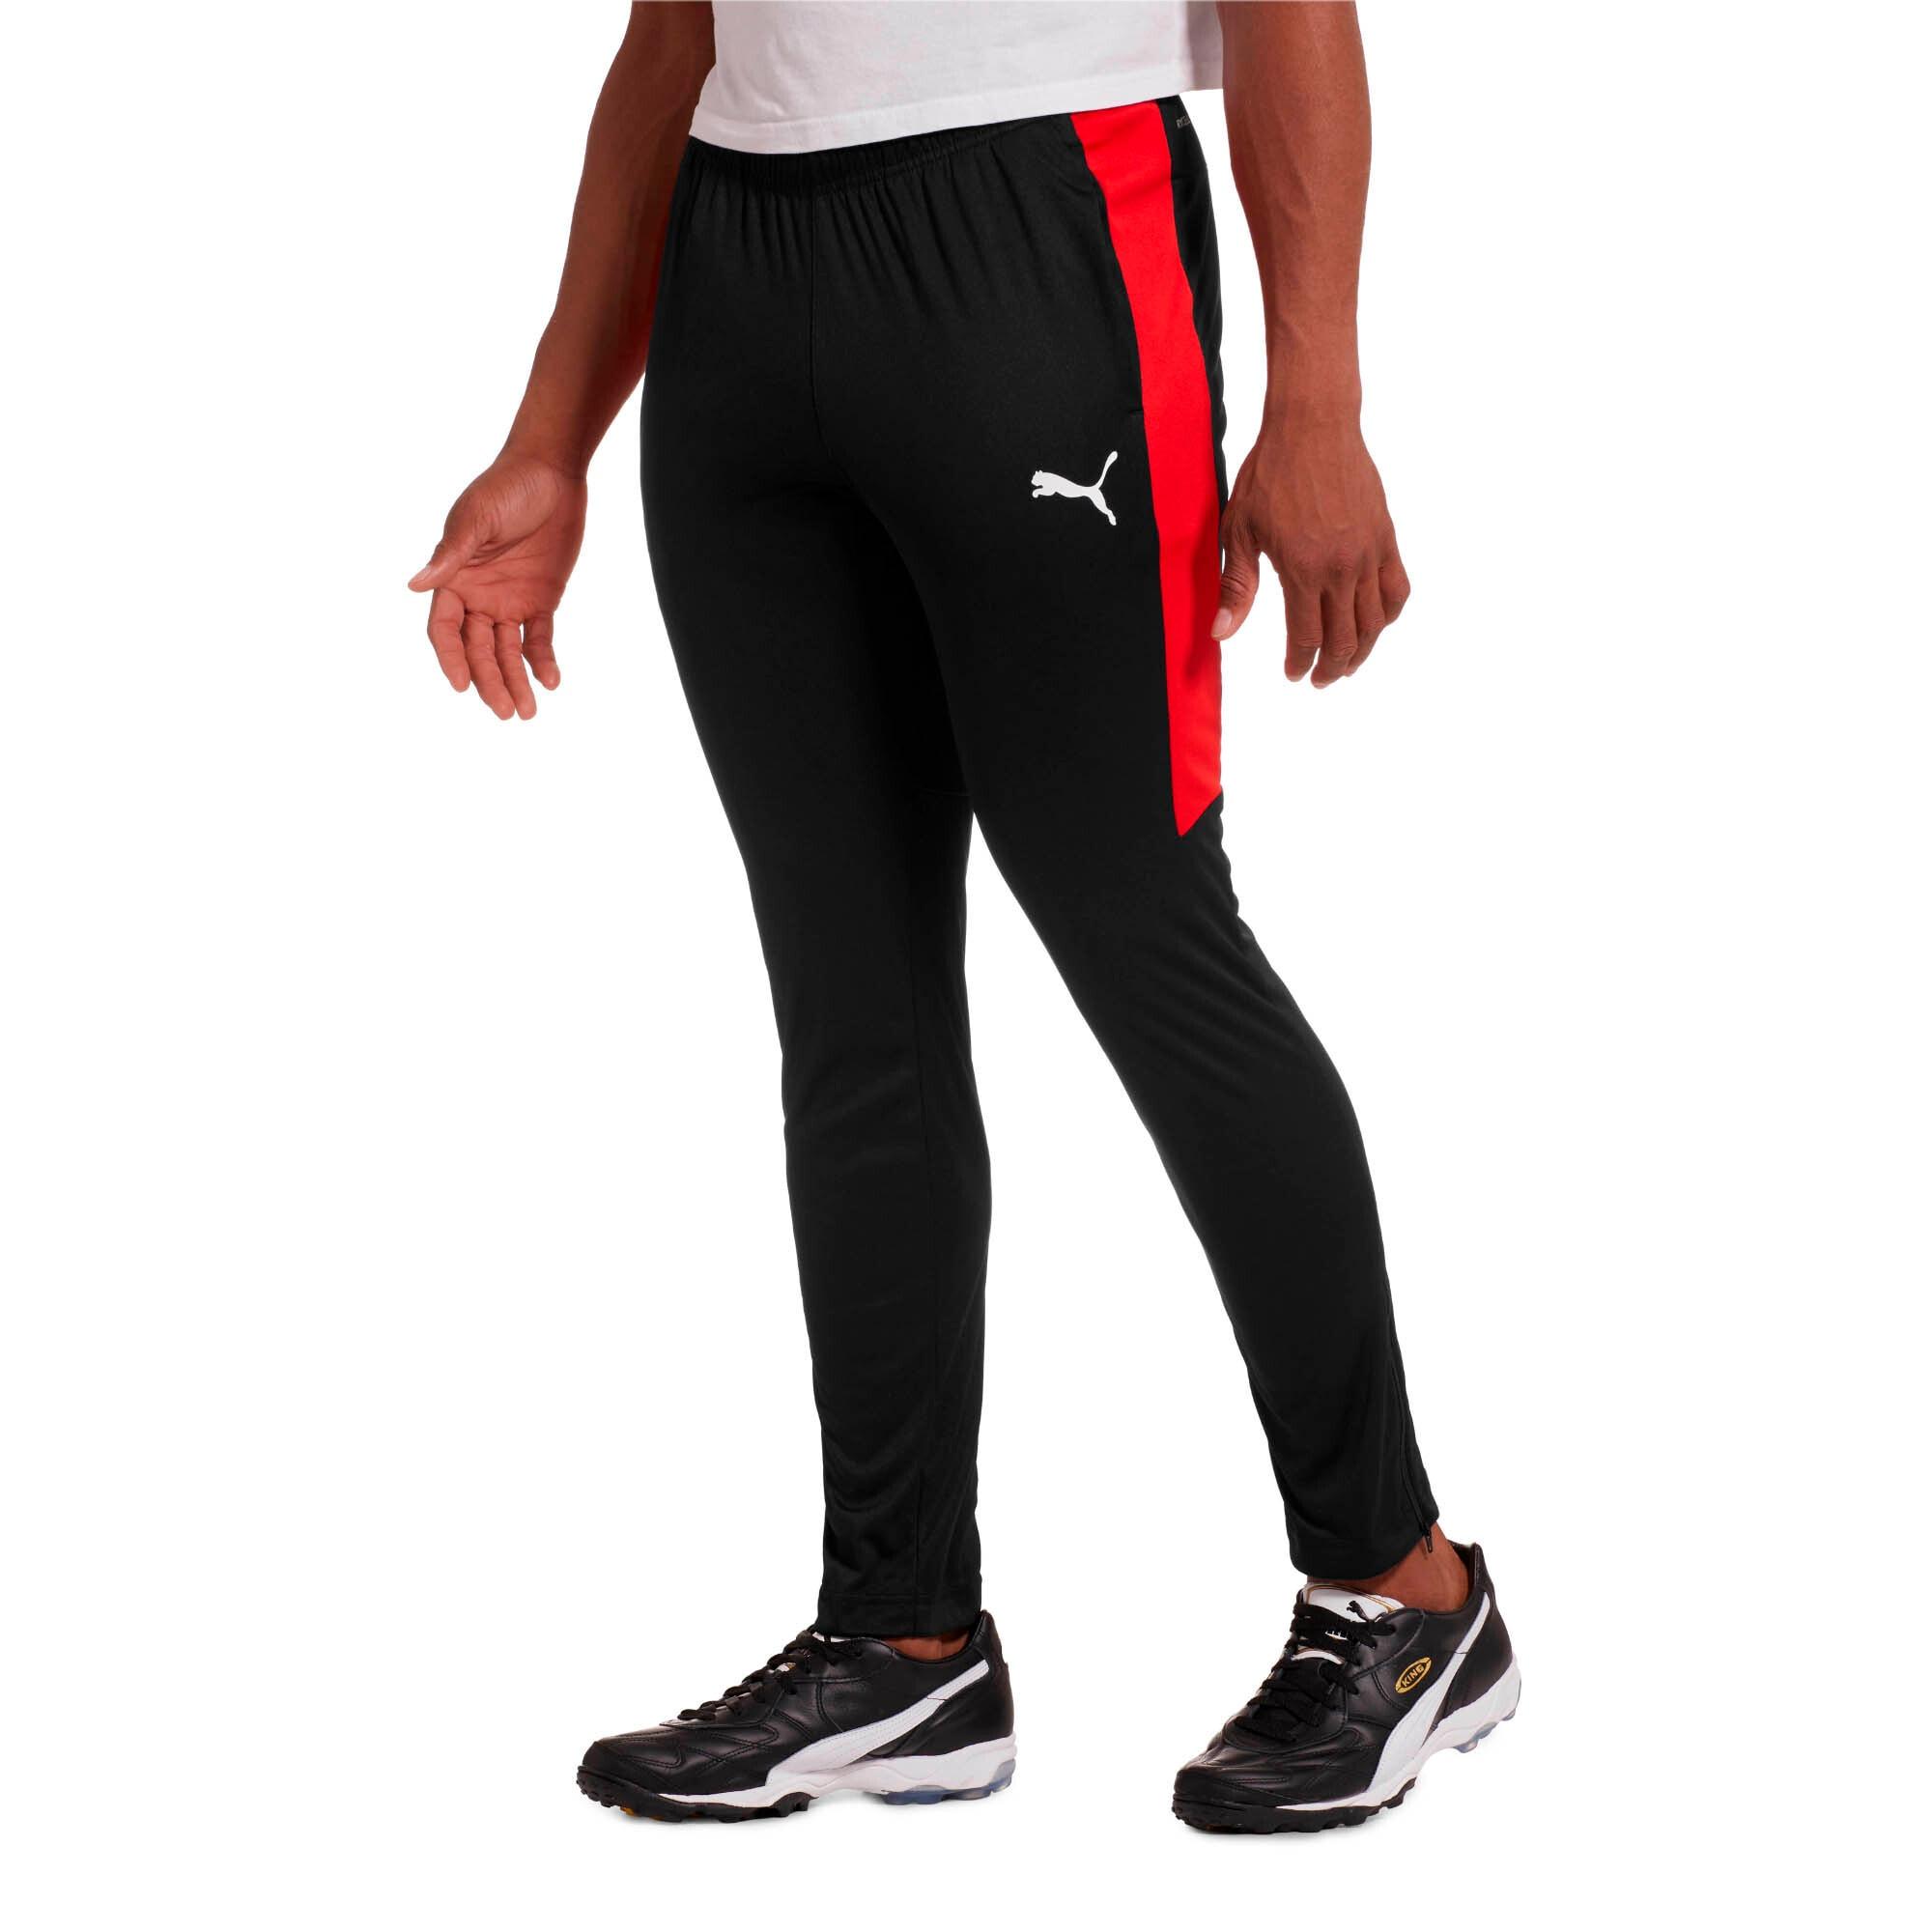 Thumbnail 1 of Men's Speed Pants, Puma Black-Puma Red, medium